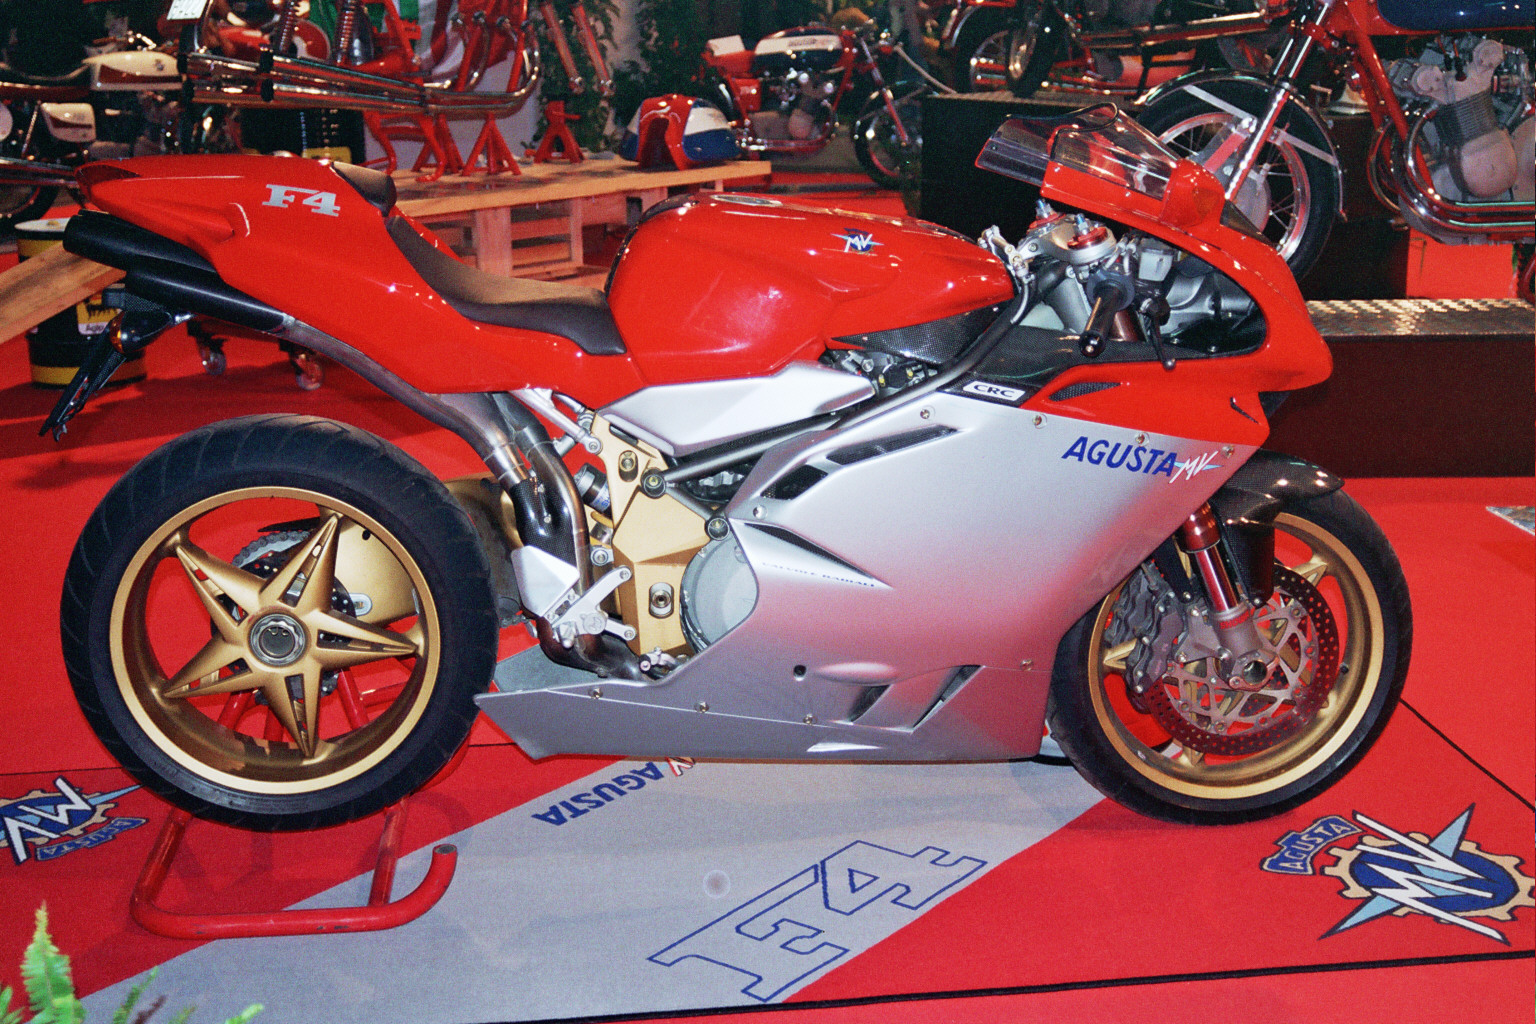 http://3.bp.blogspot.com/_SJZzHWvv1FE/TRVyU3IjtxI/AAAAAAAADfw/56YrReZV7lM/s1600/MV_Agusta_F4_Serie_Oro.jpg